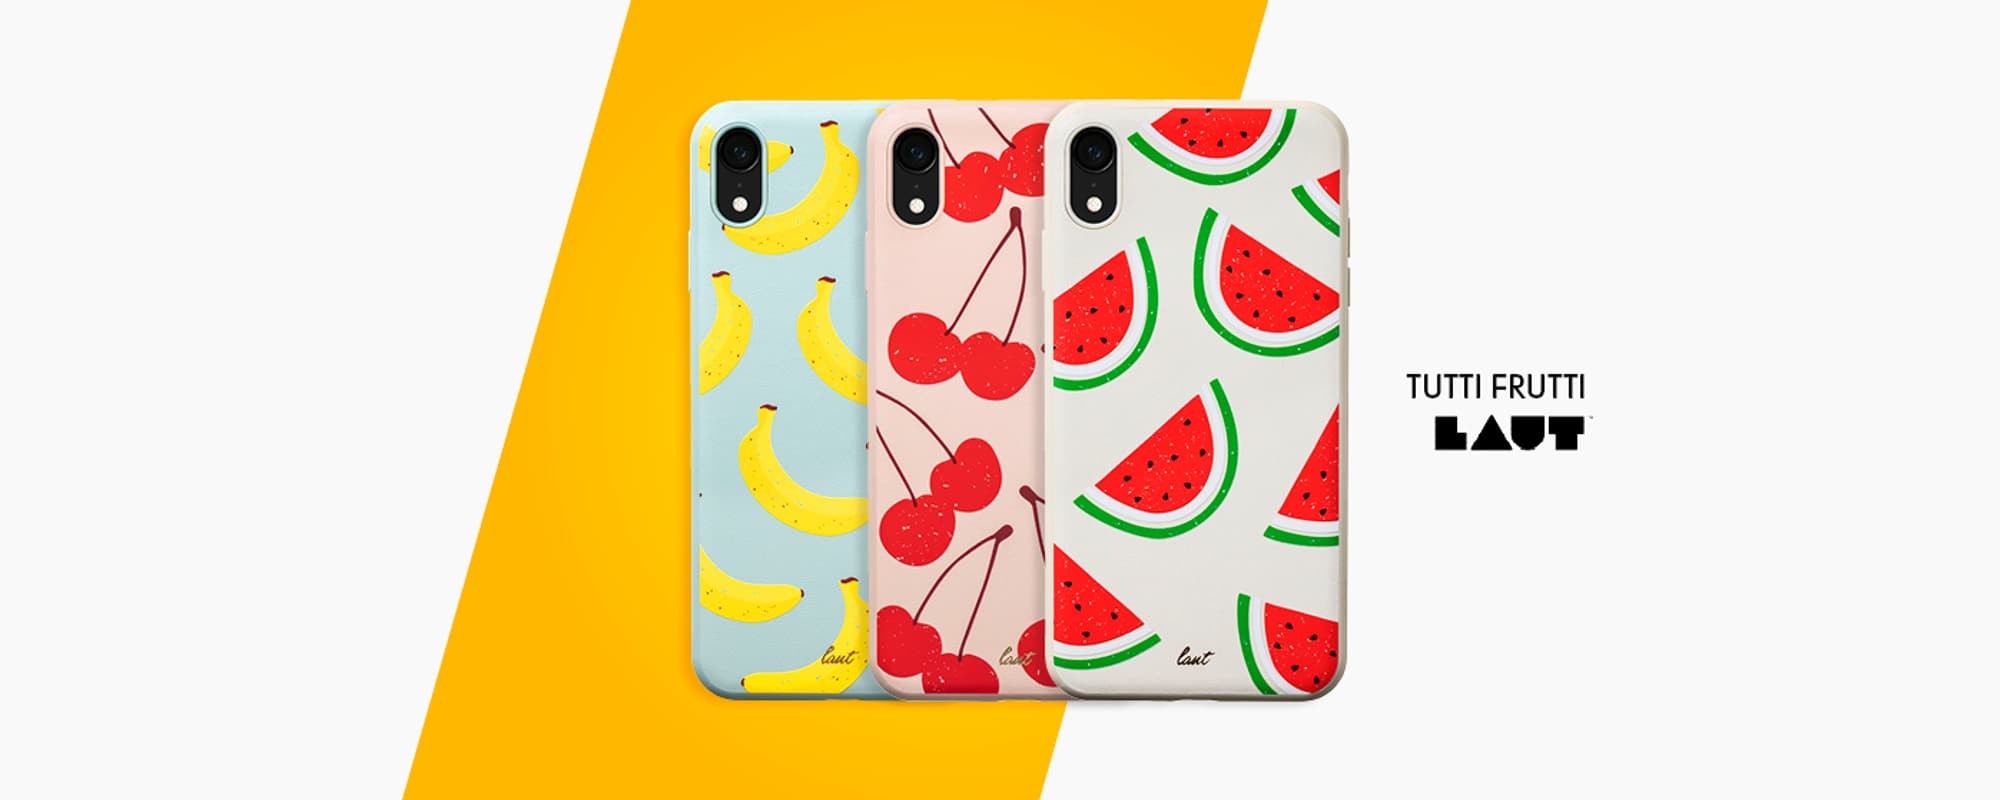 Tutti Frutti von Laut